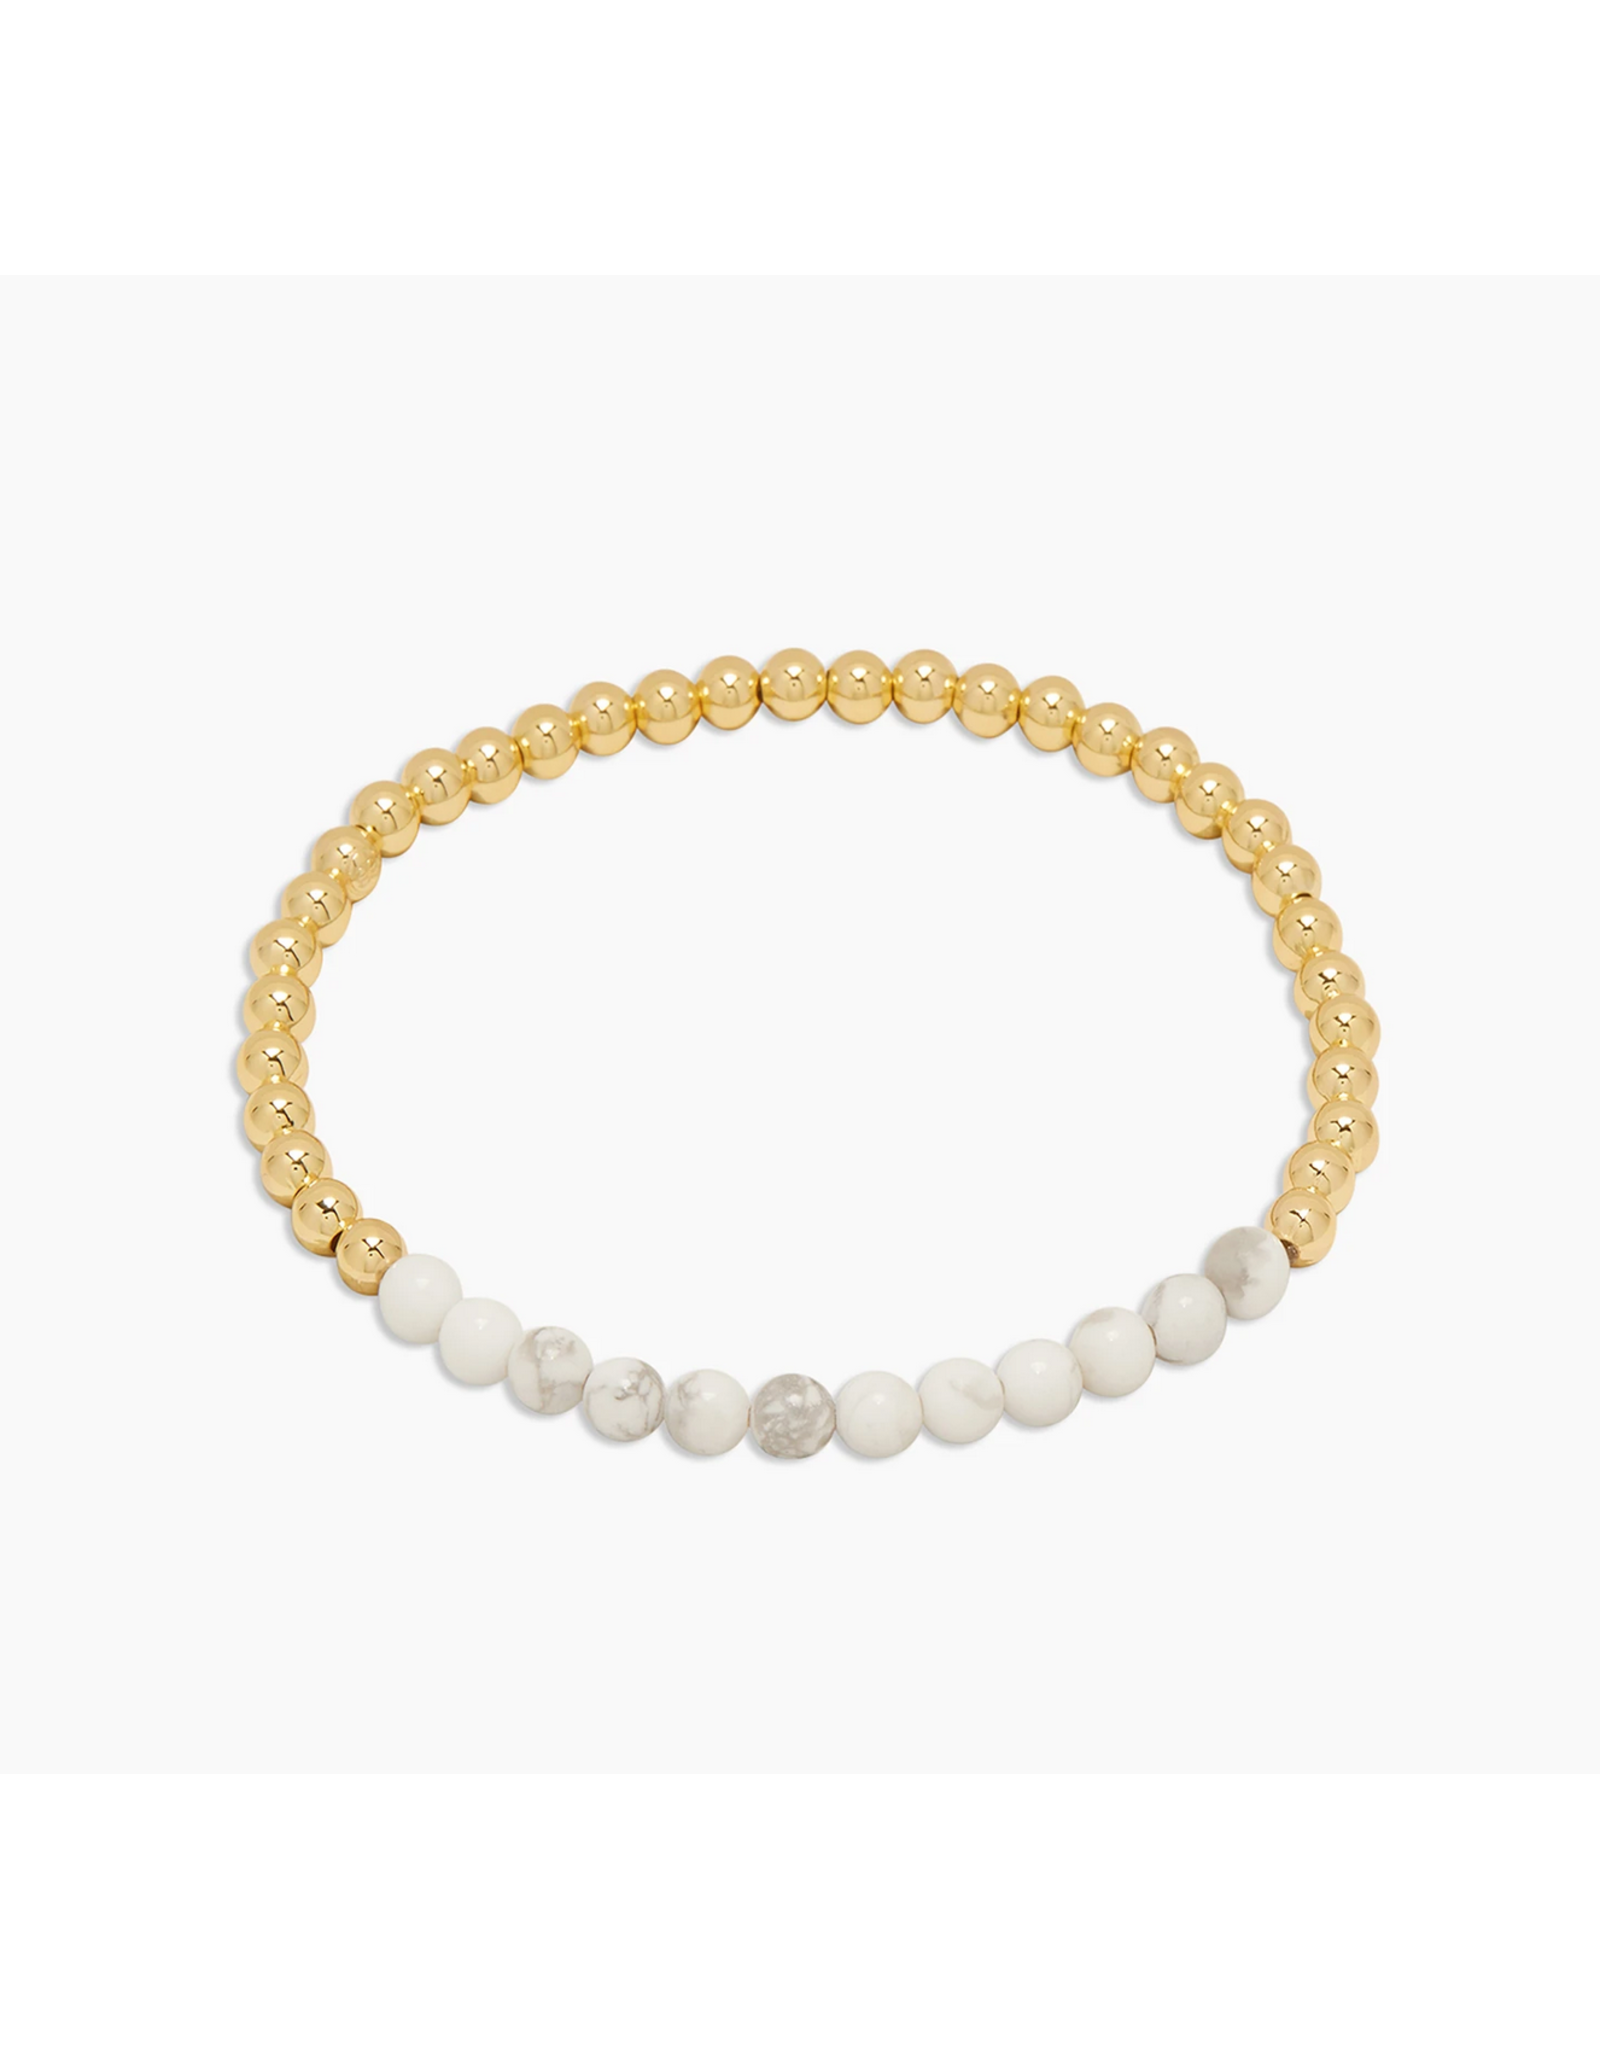 Power Gemstone Aura Bracelet for Calm